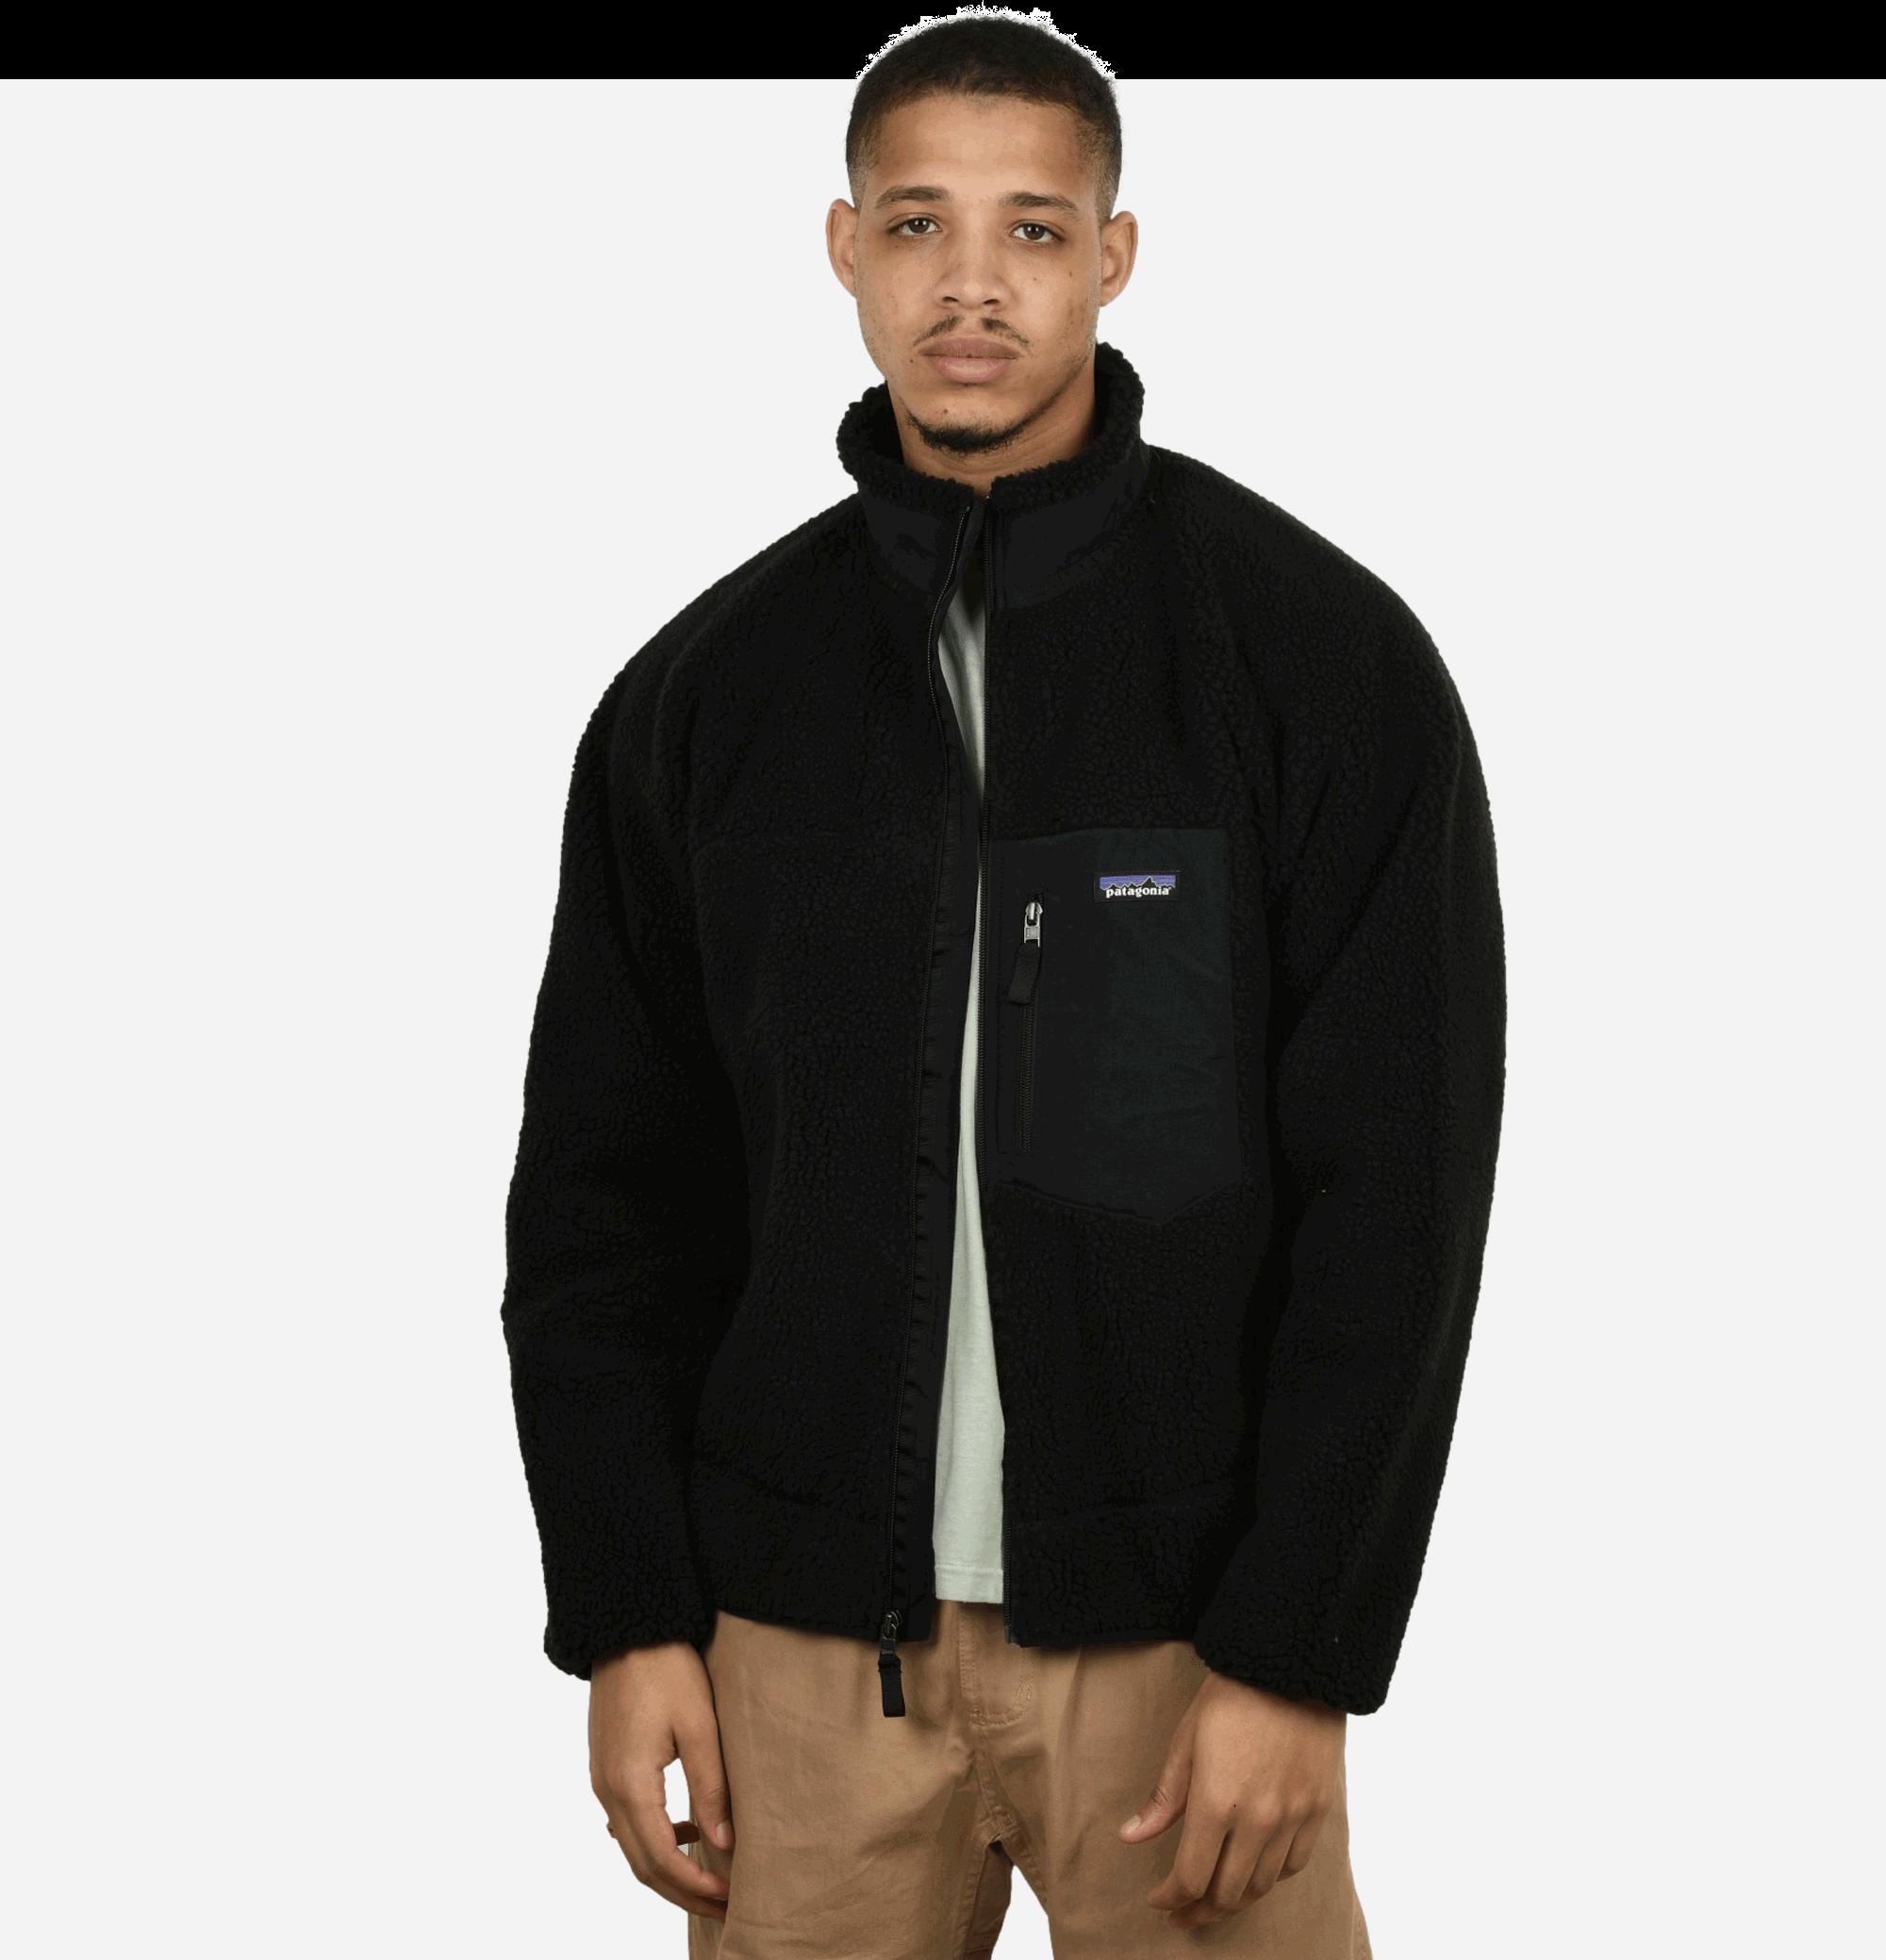 Retro X Jacket Black